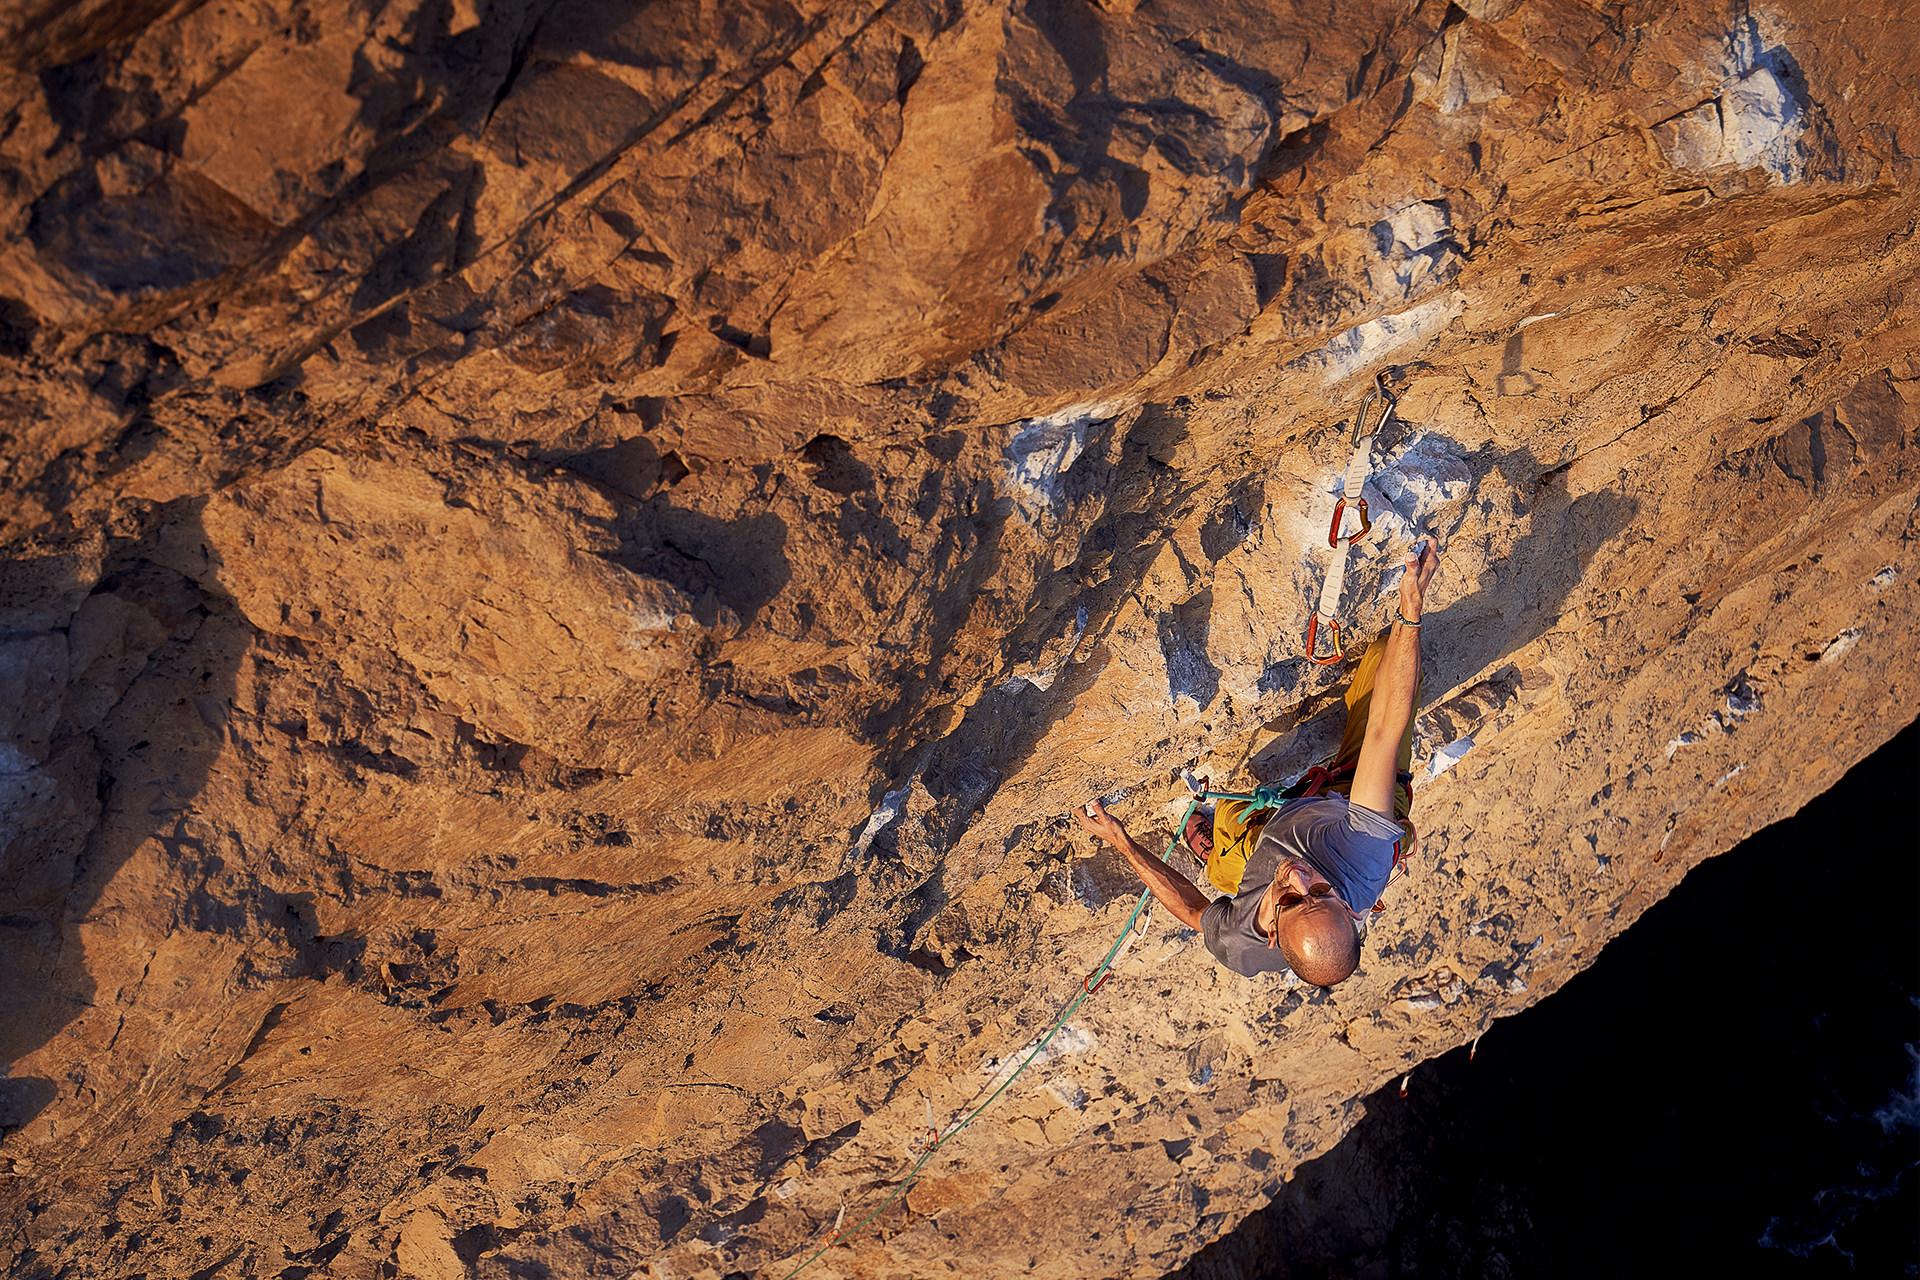 Lisbon Climbing Guide - Luís Moreno climbing Caldo Verde (7b) in Atlântida ©Martim Vidigal